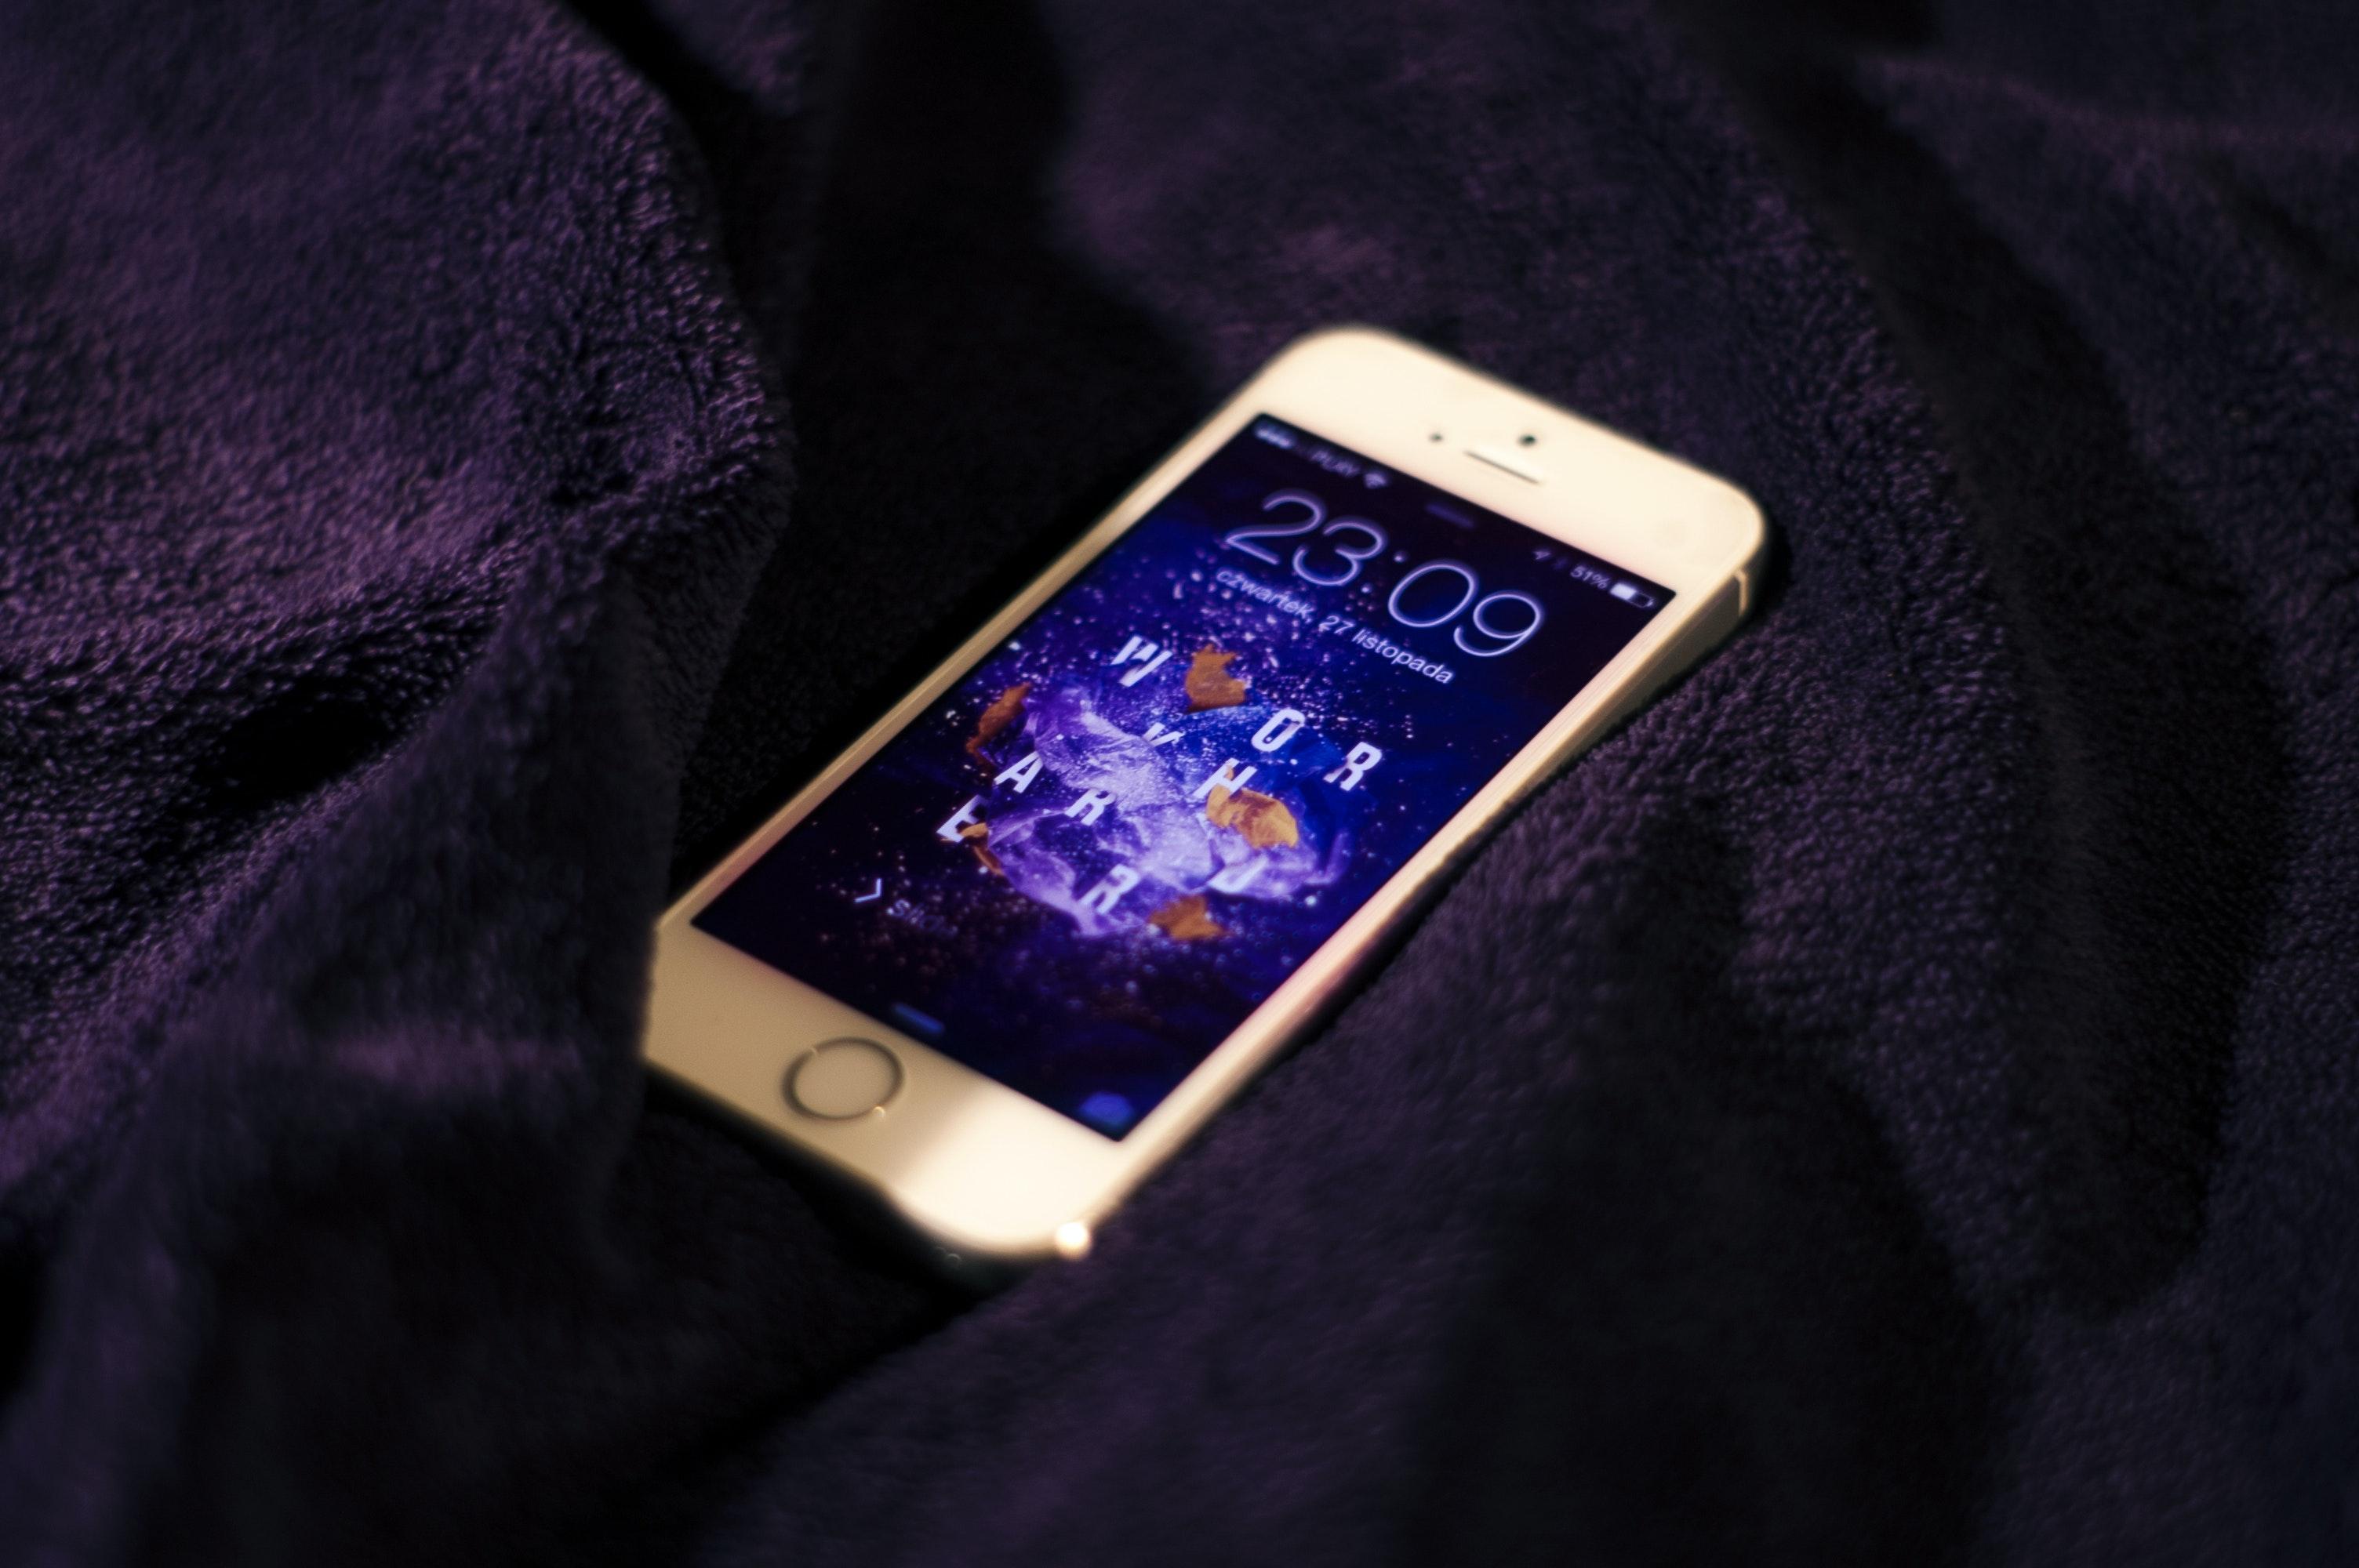 Cool Wallpaper Night Iphone - iphone-wallpaper-night-86025  Pictures-363392.jpg\u0026fm\u003djpg